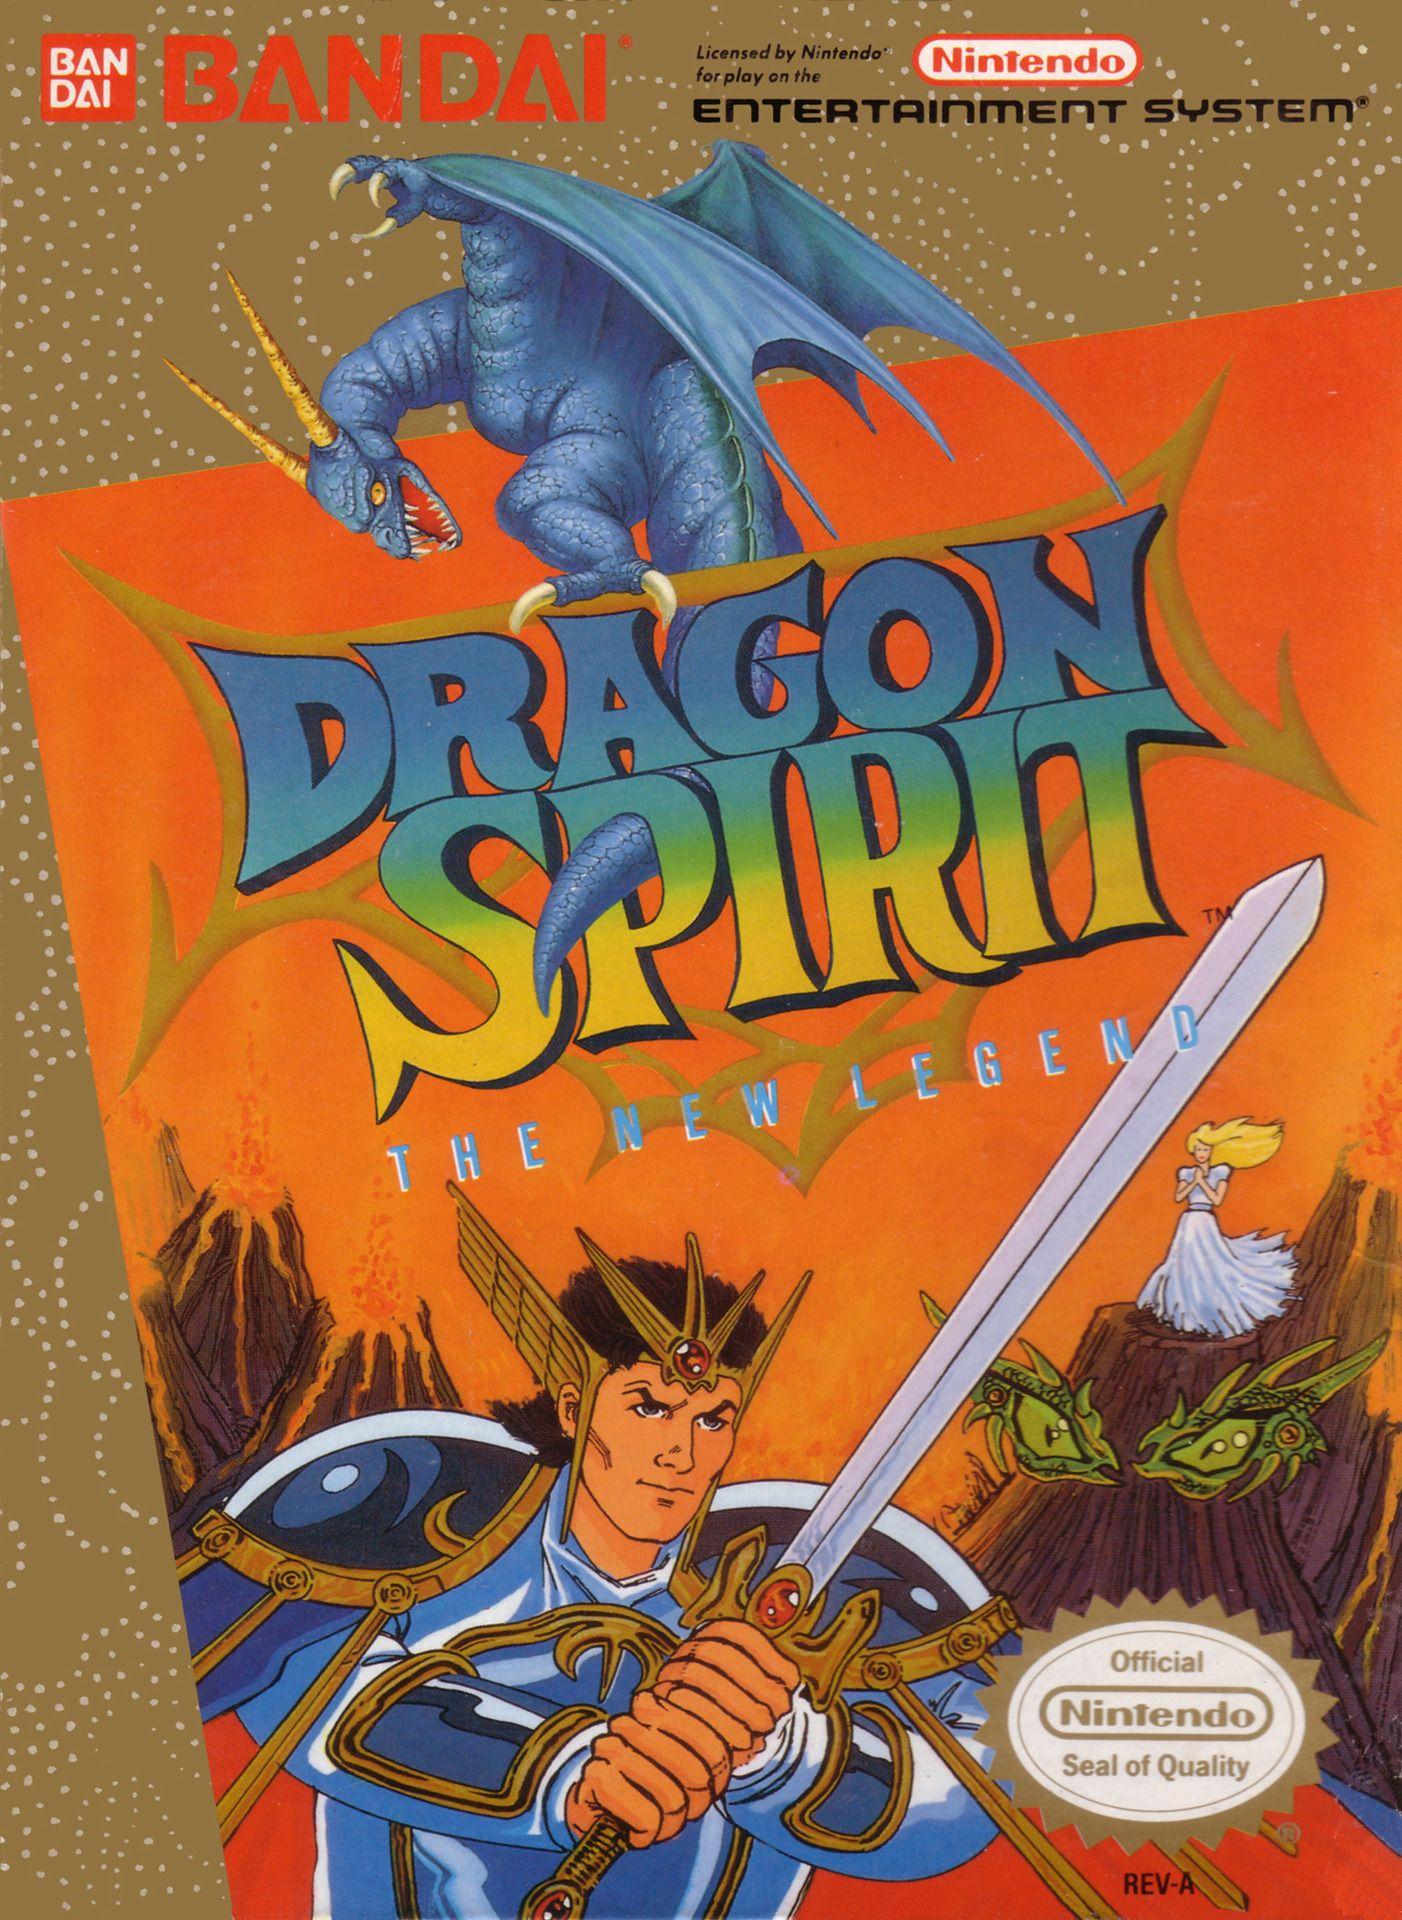 Dragon Spirit - The New Legend (Bandai, 1989) #nintendo #nes #